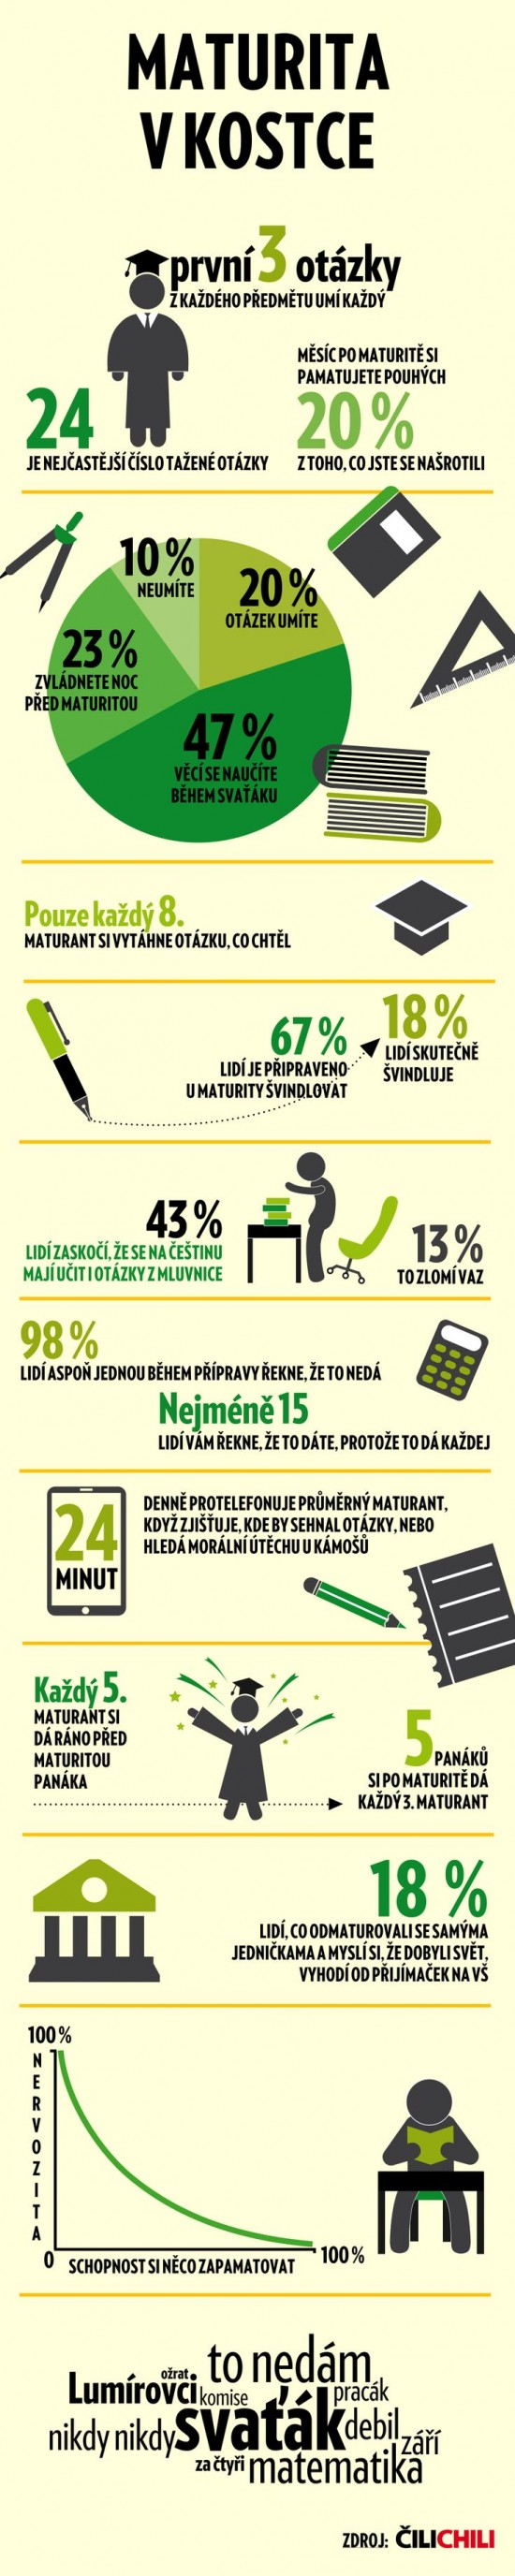 Maturita v kostce - infografika